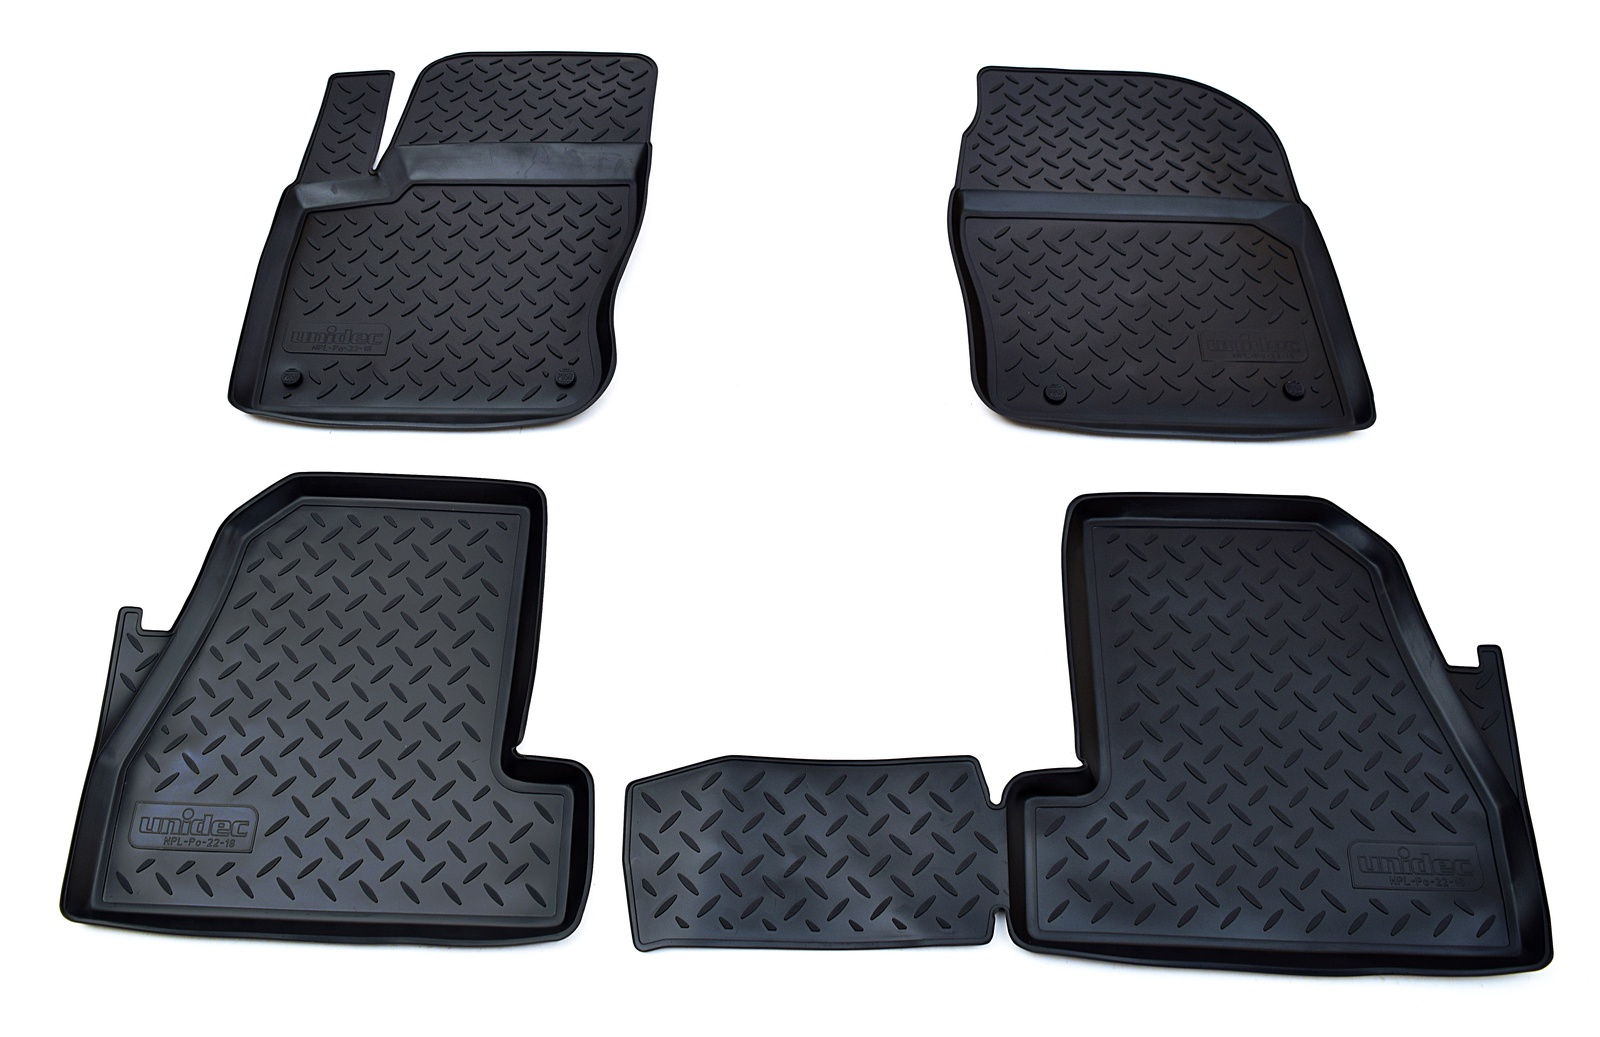 цена на Коврики в салон Norplast для Ford Focus III 2011-2015, NPL-Po-22-18, черный